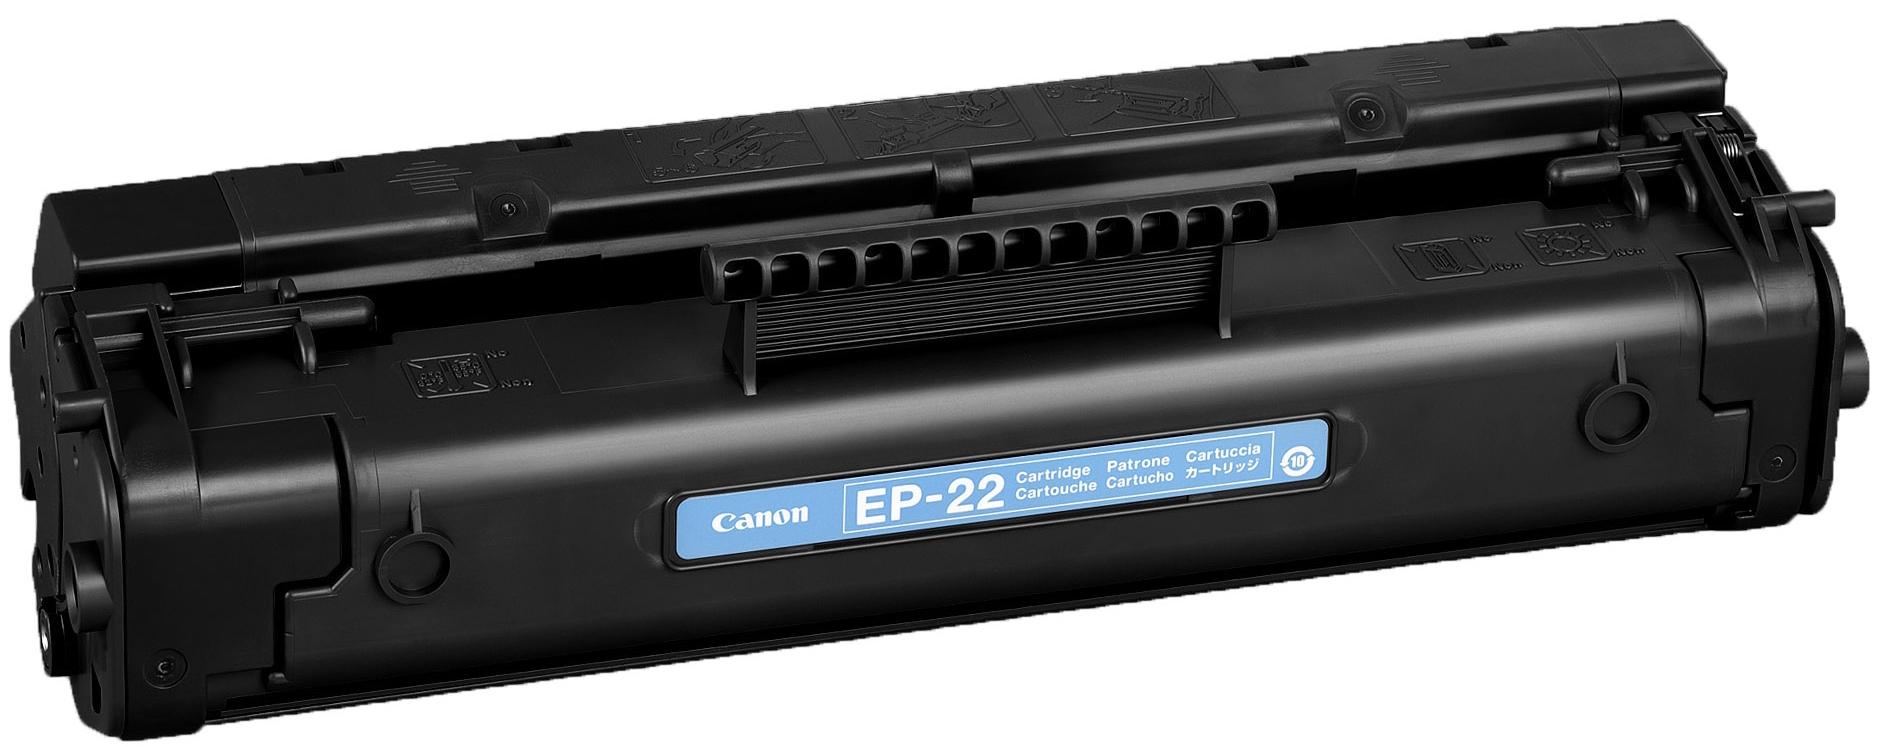 Canon EP-22 - картридж для принтеров Canon Laser Shot LBP-250/350/800/810/1110/1120 (Black)